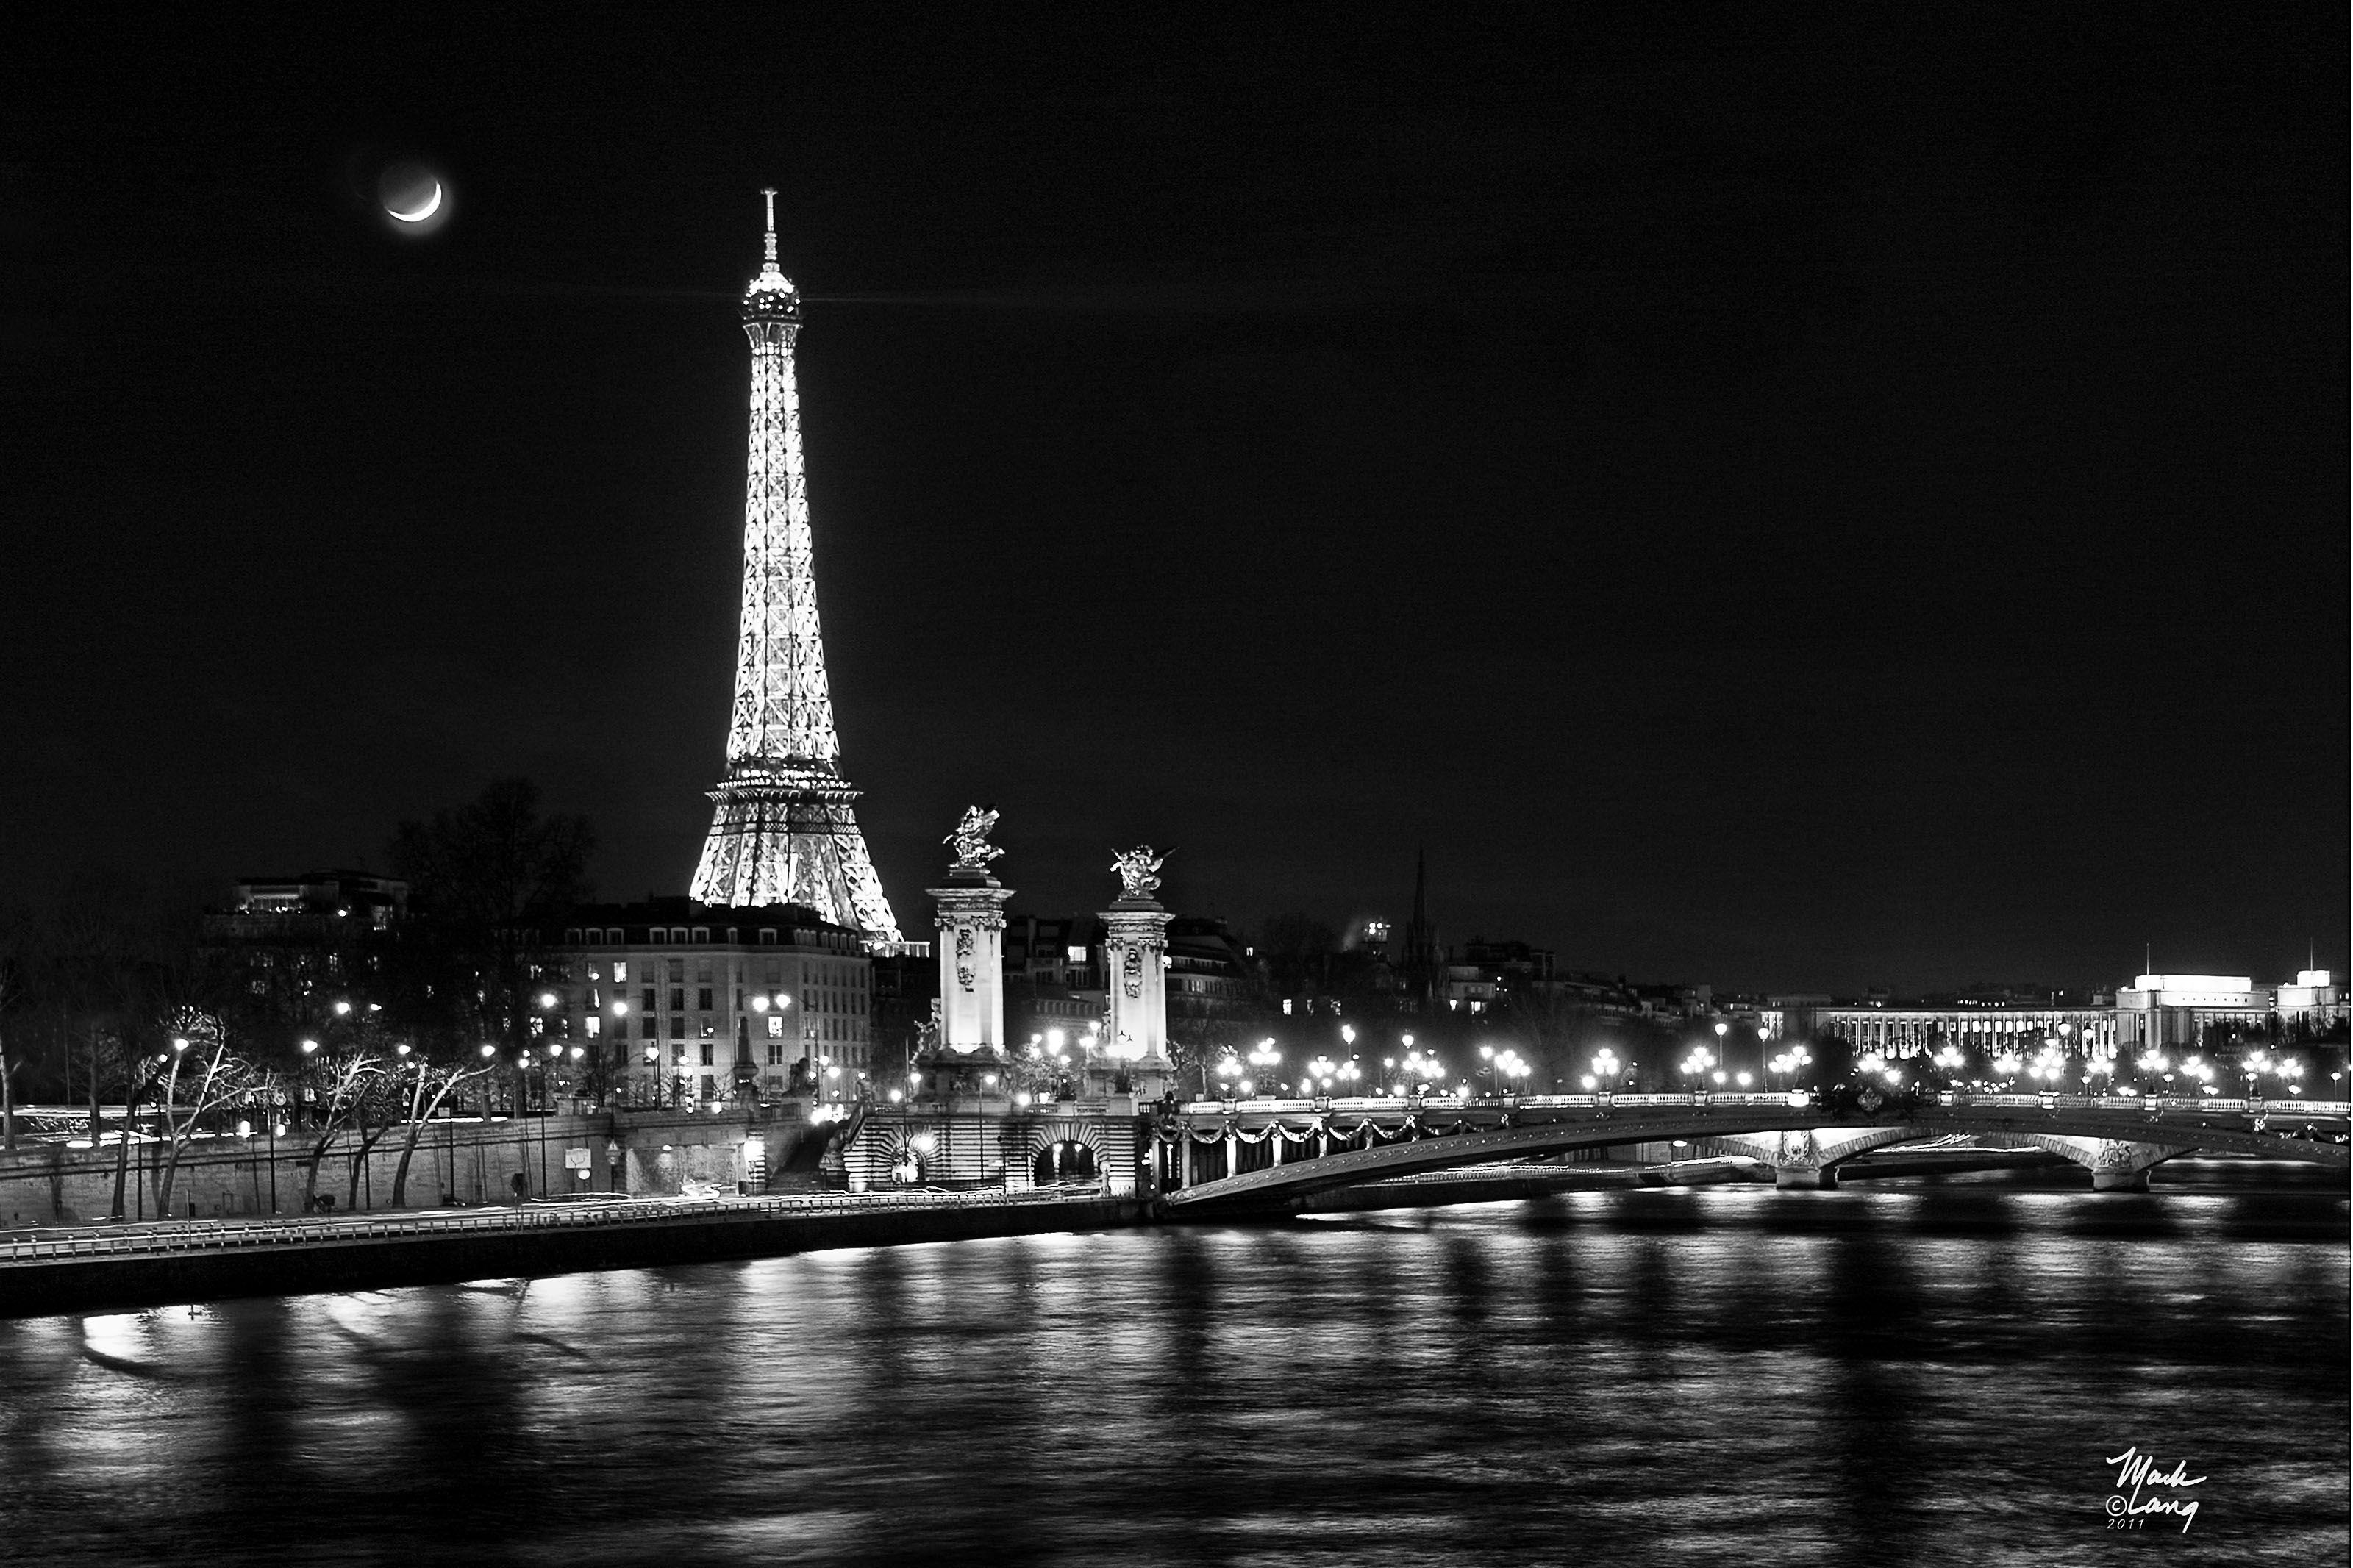 Eiffel Tower Black And White Landscape - Google